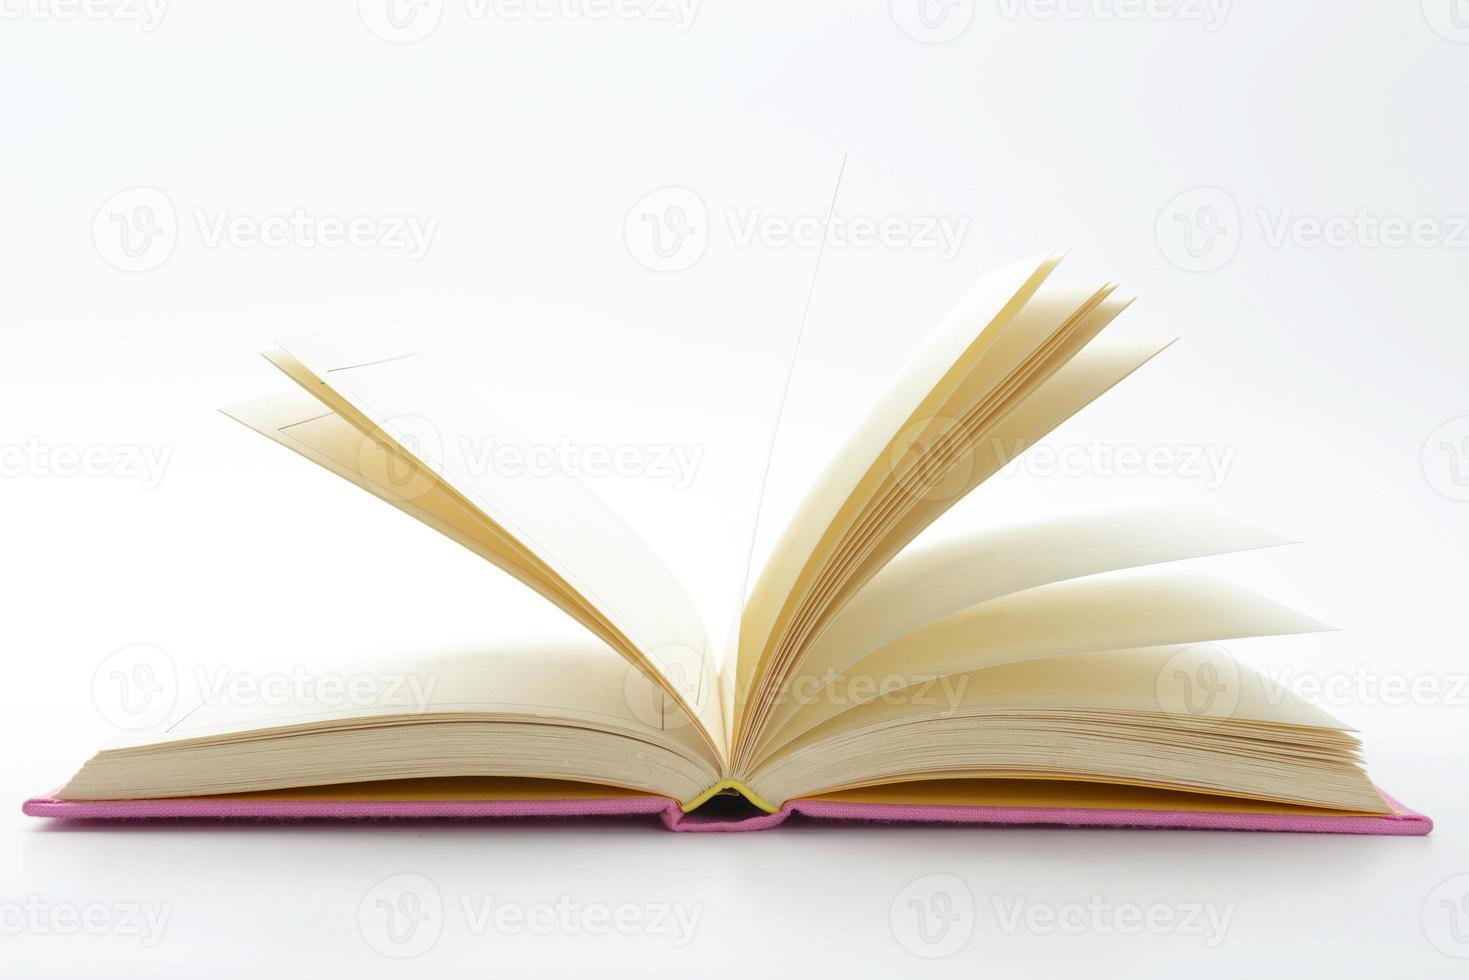 libro aperto su sfondo bianco foto